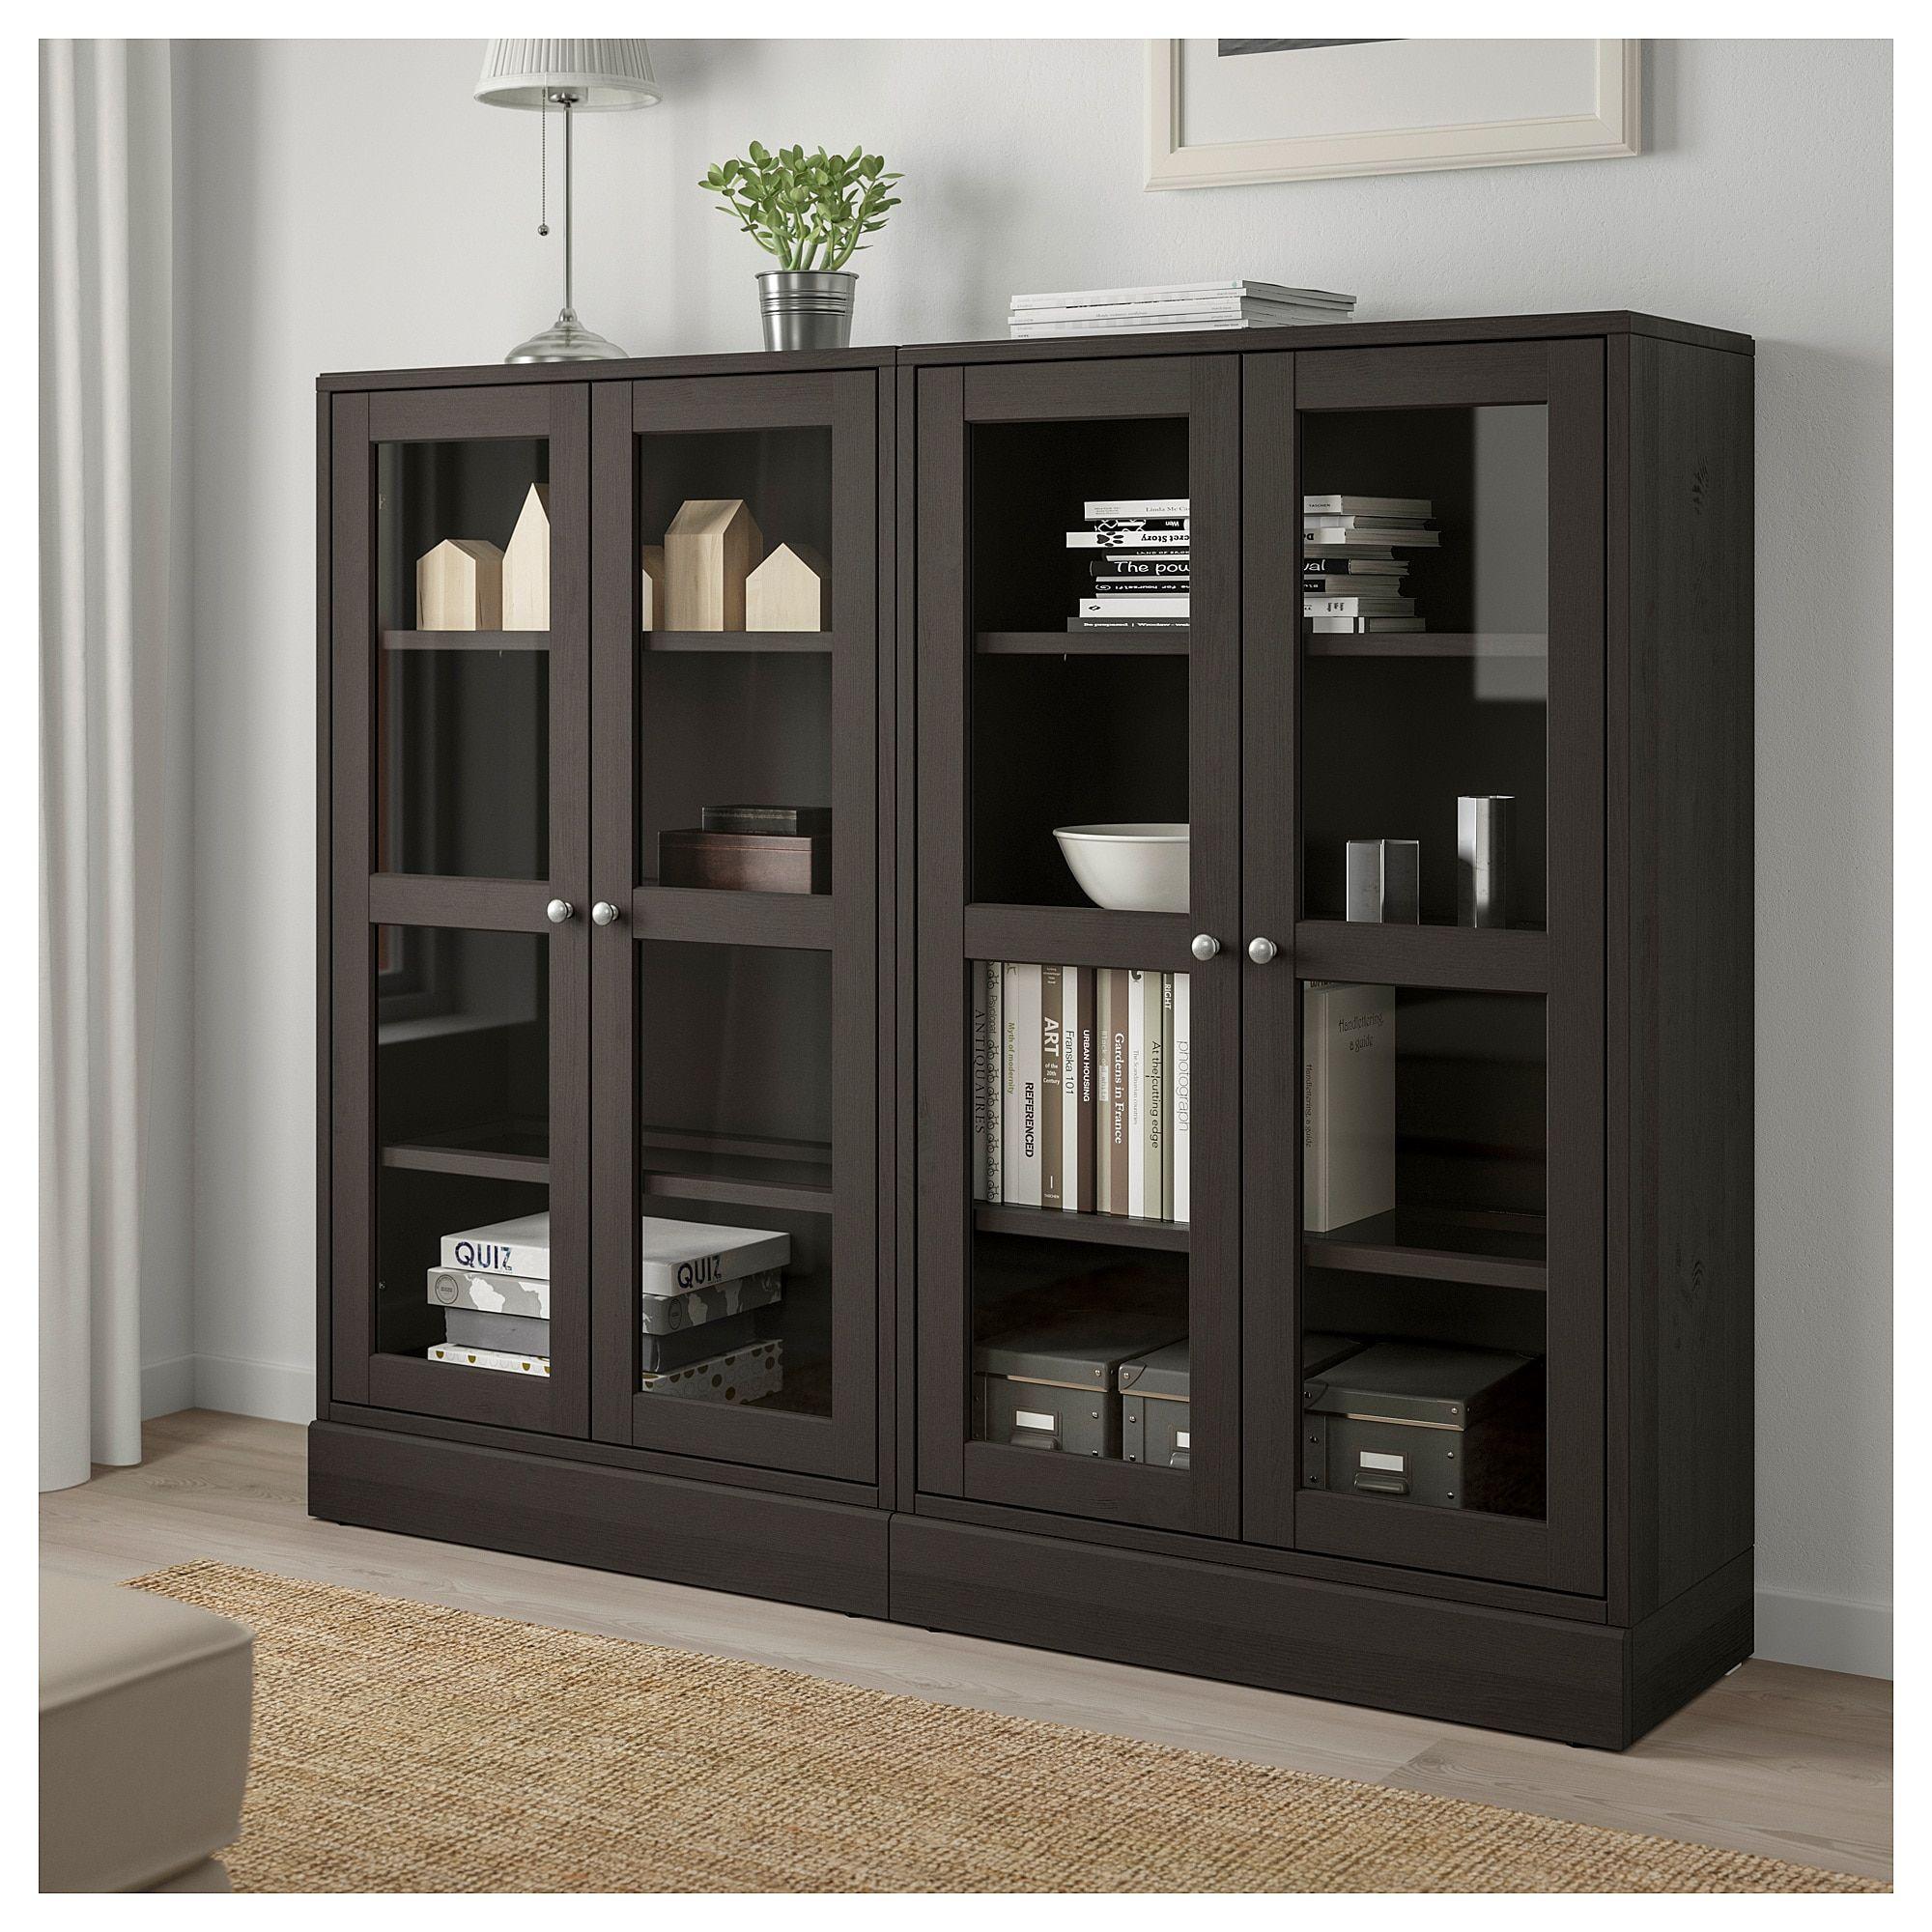 HAVSTA Storage Combination W/glass Doors Dark Brown